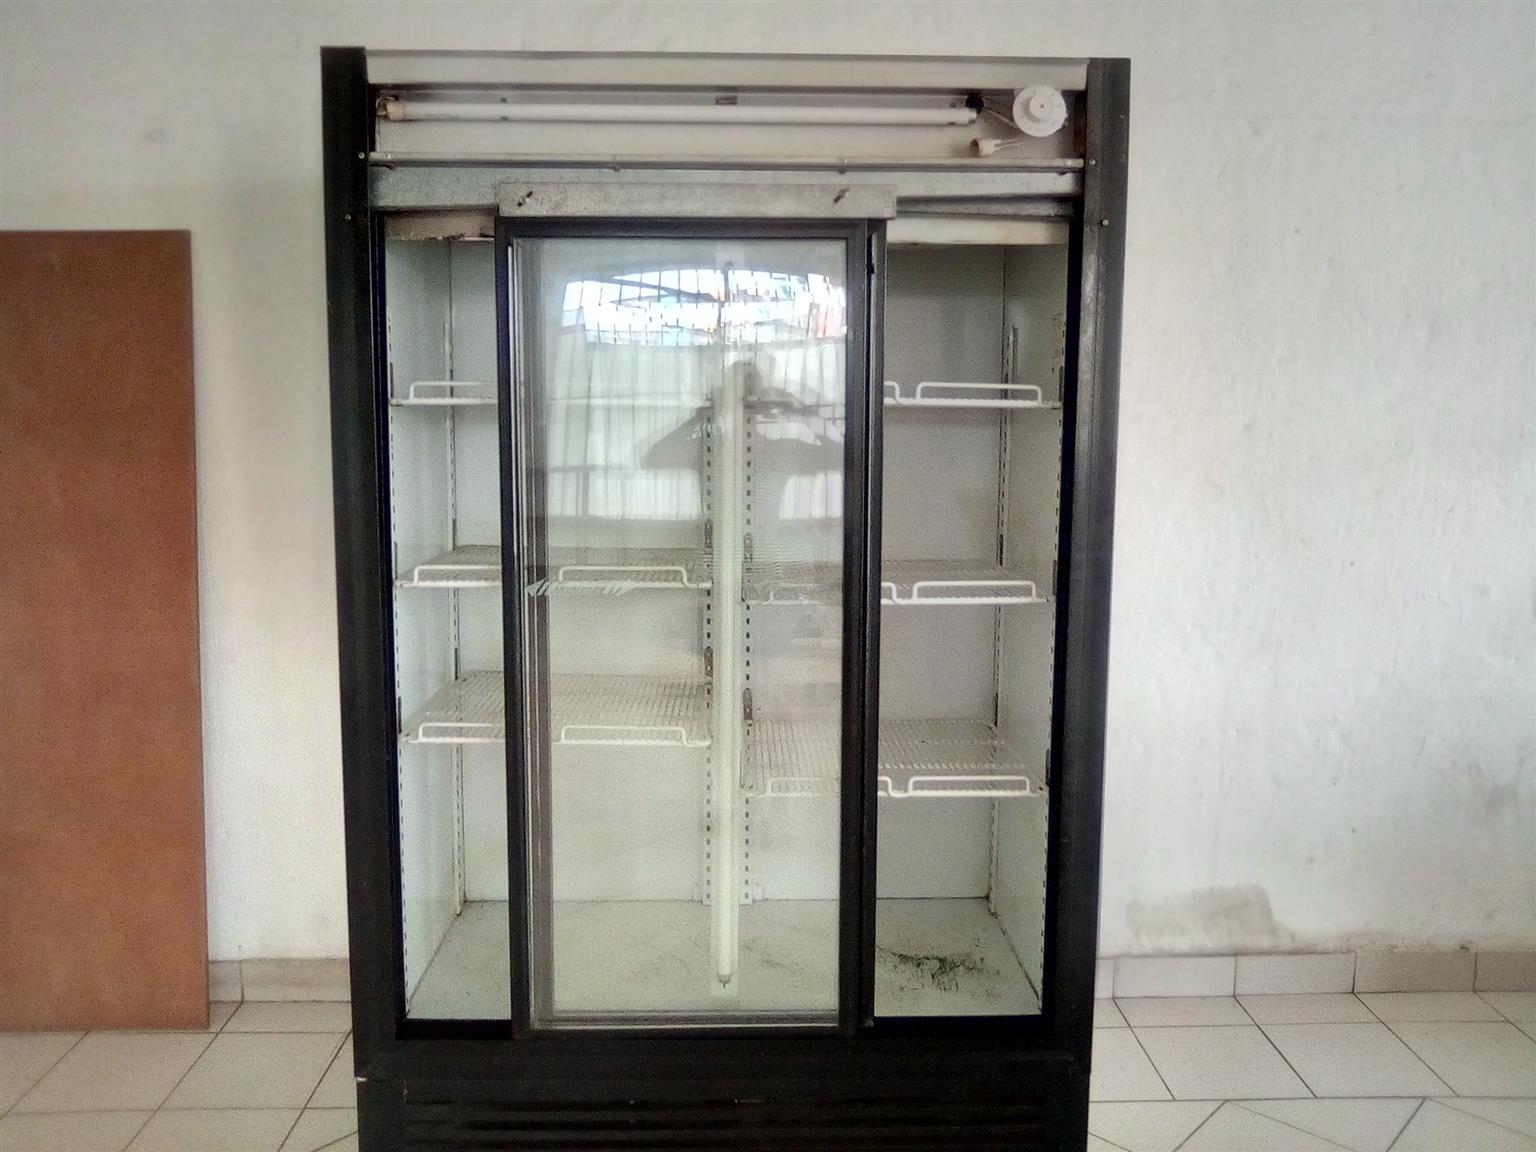 Freezer and frige